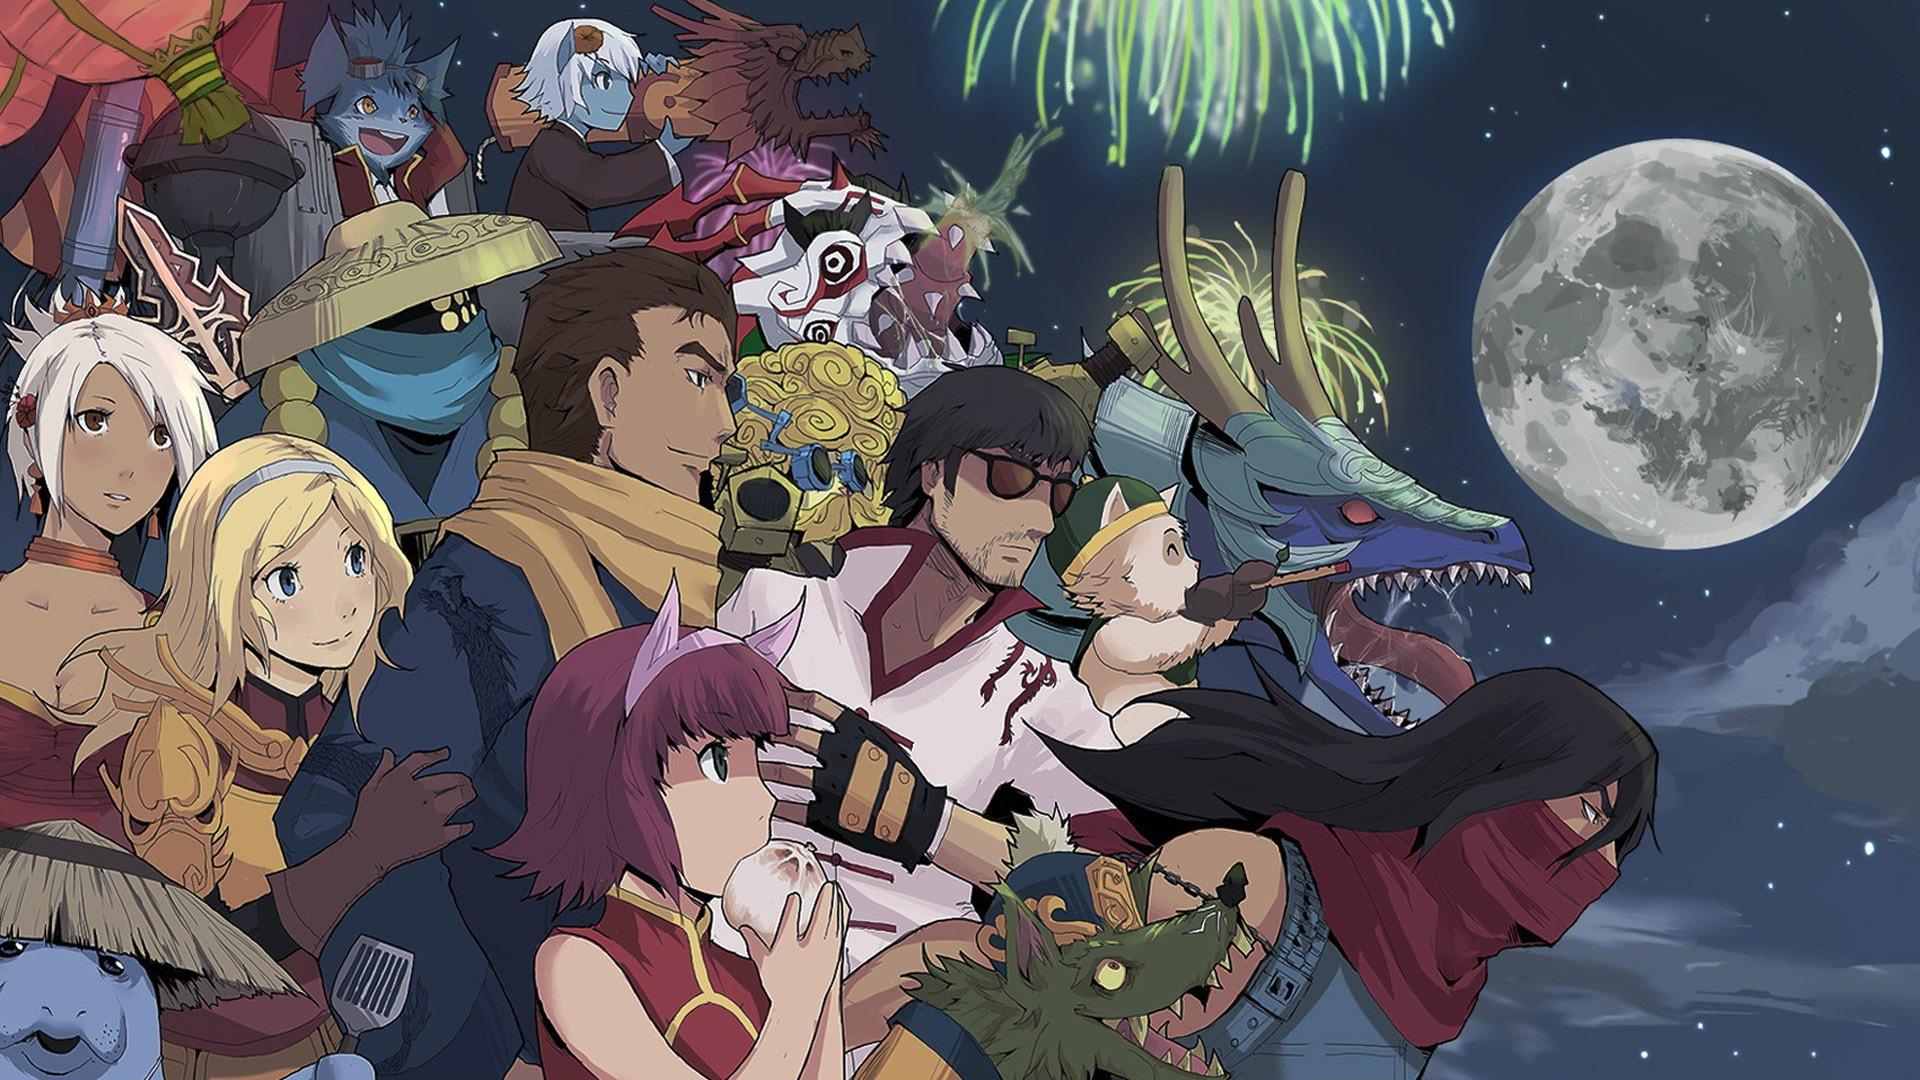 Anime League of Legends Wallpaper 1920x1080